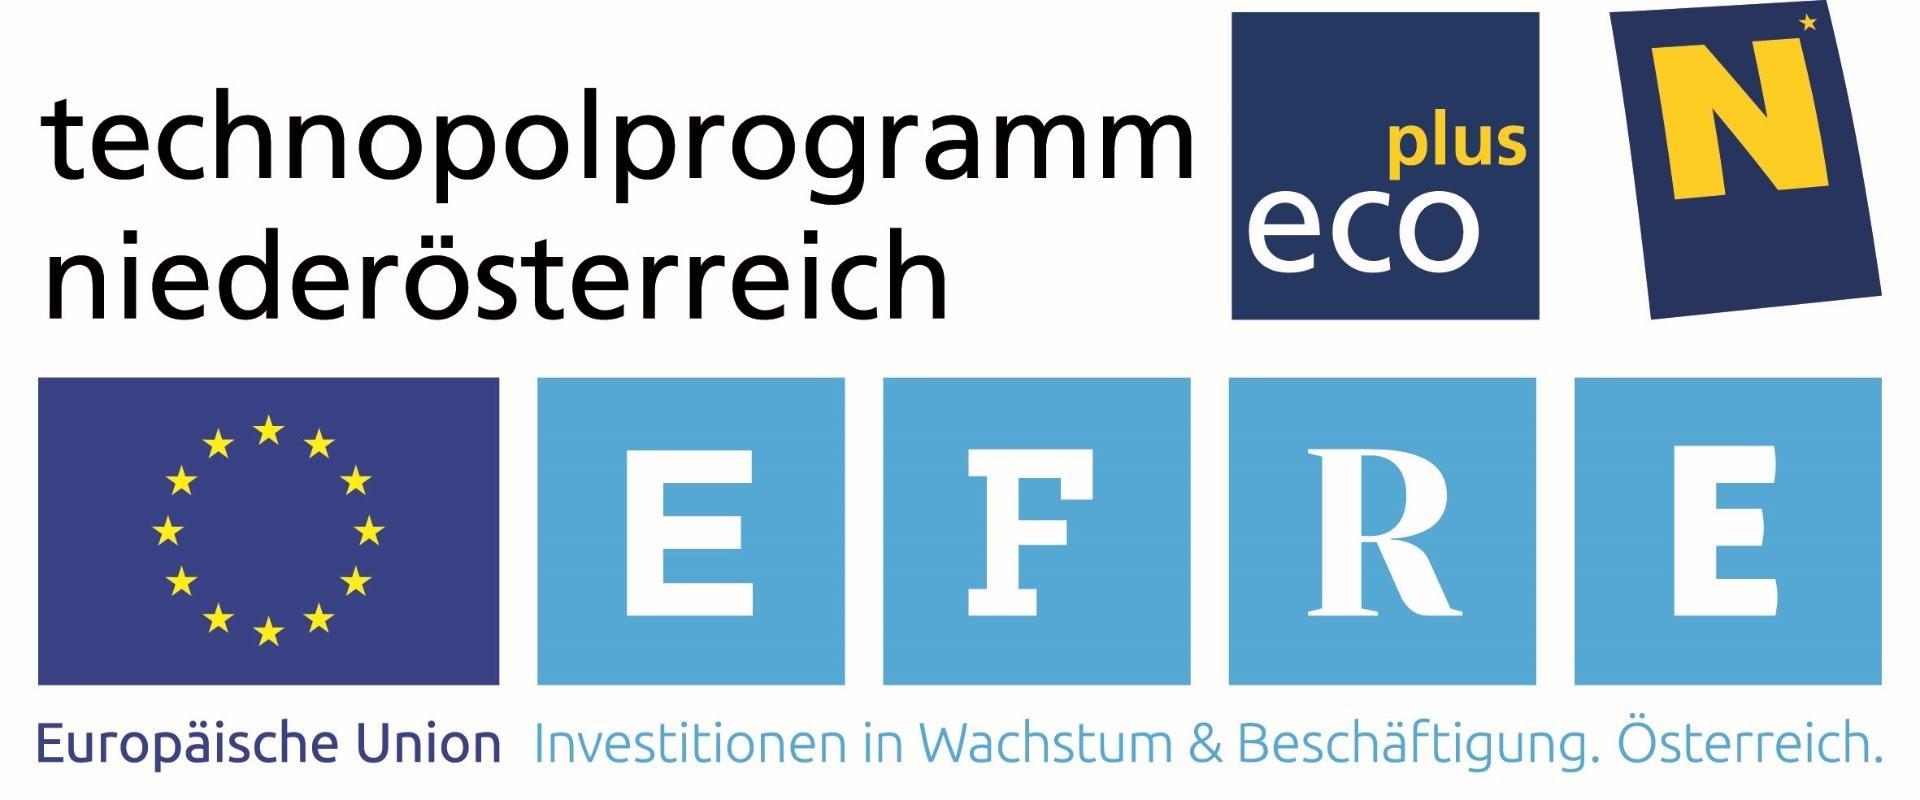 Technopolprogramm-verheiratet-Blockversion-deutsch_Sponsorlogo-Ecoplus-Technopol-neu.jpg